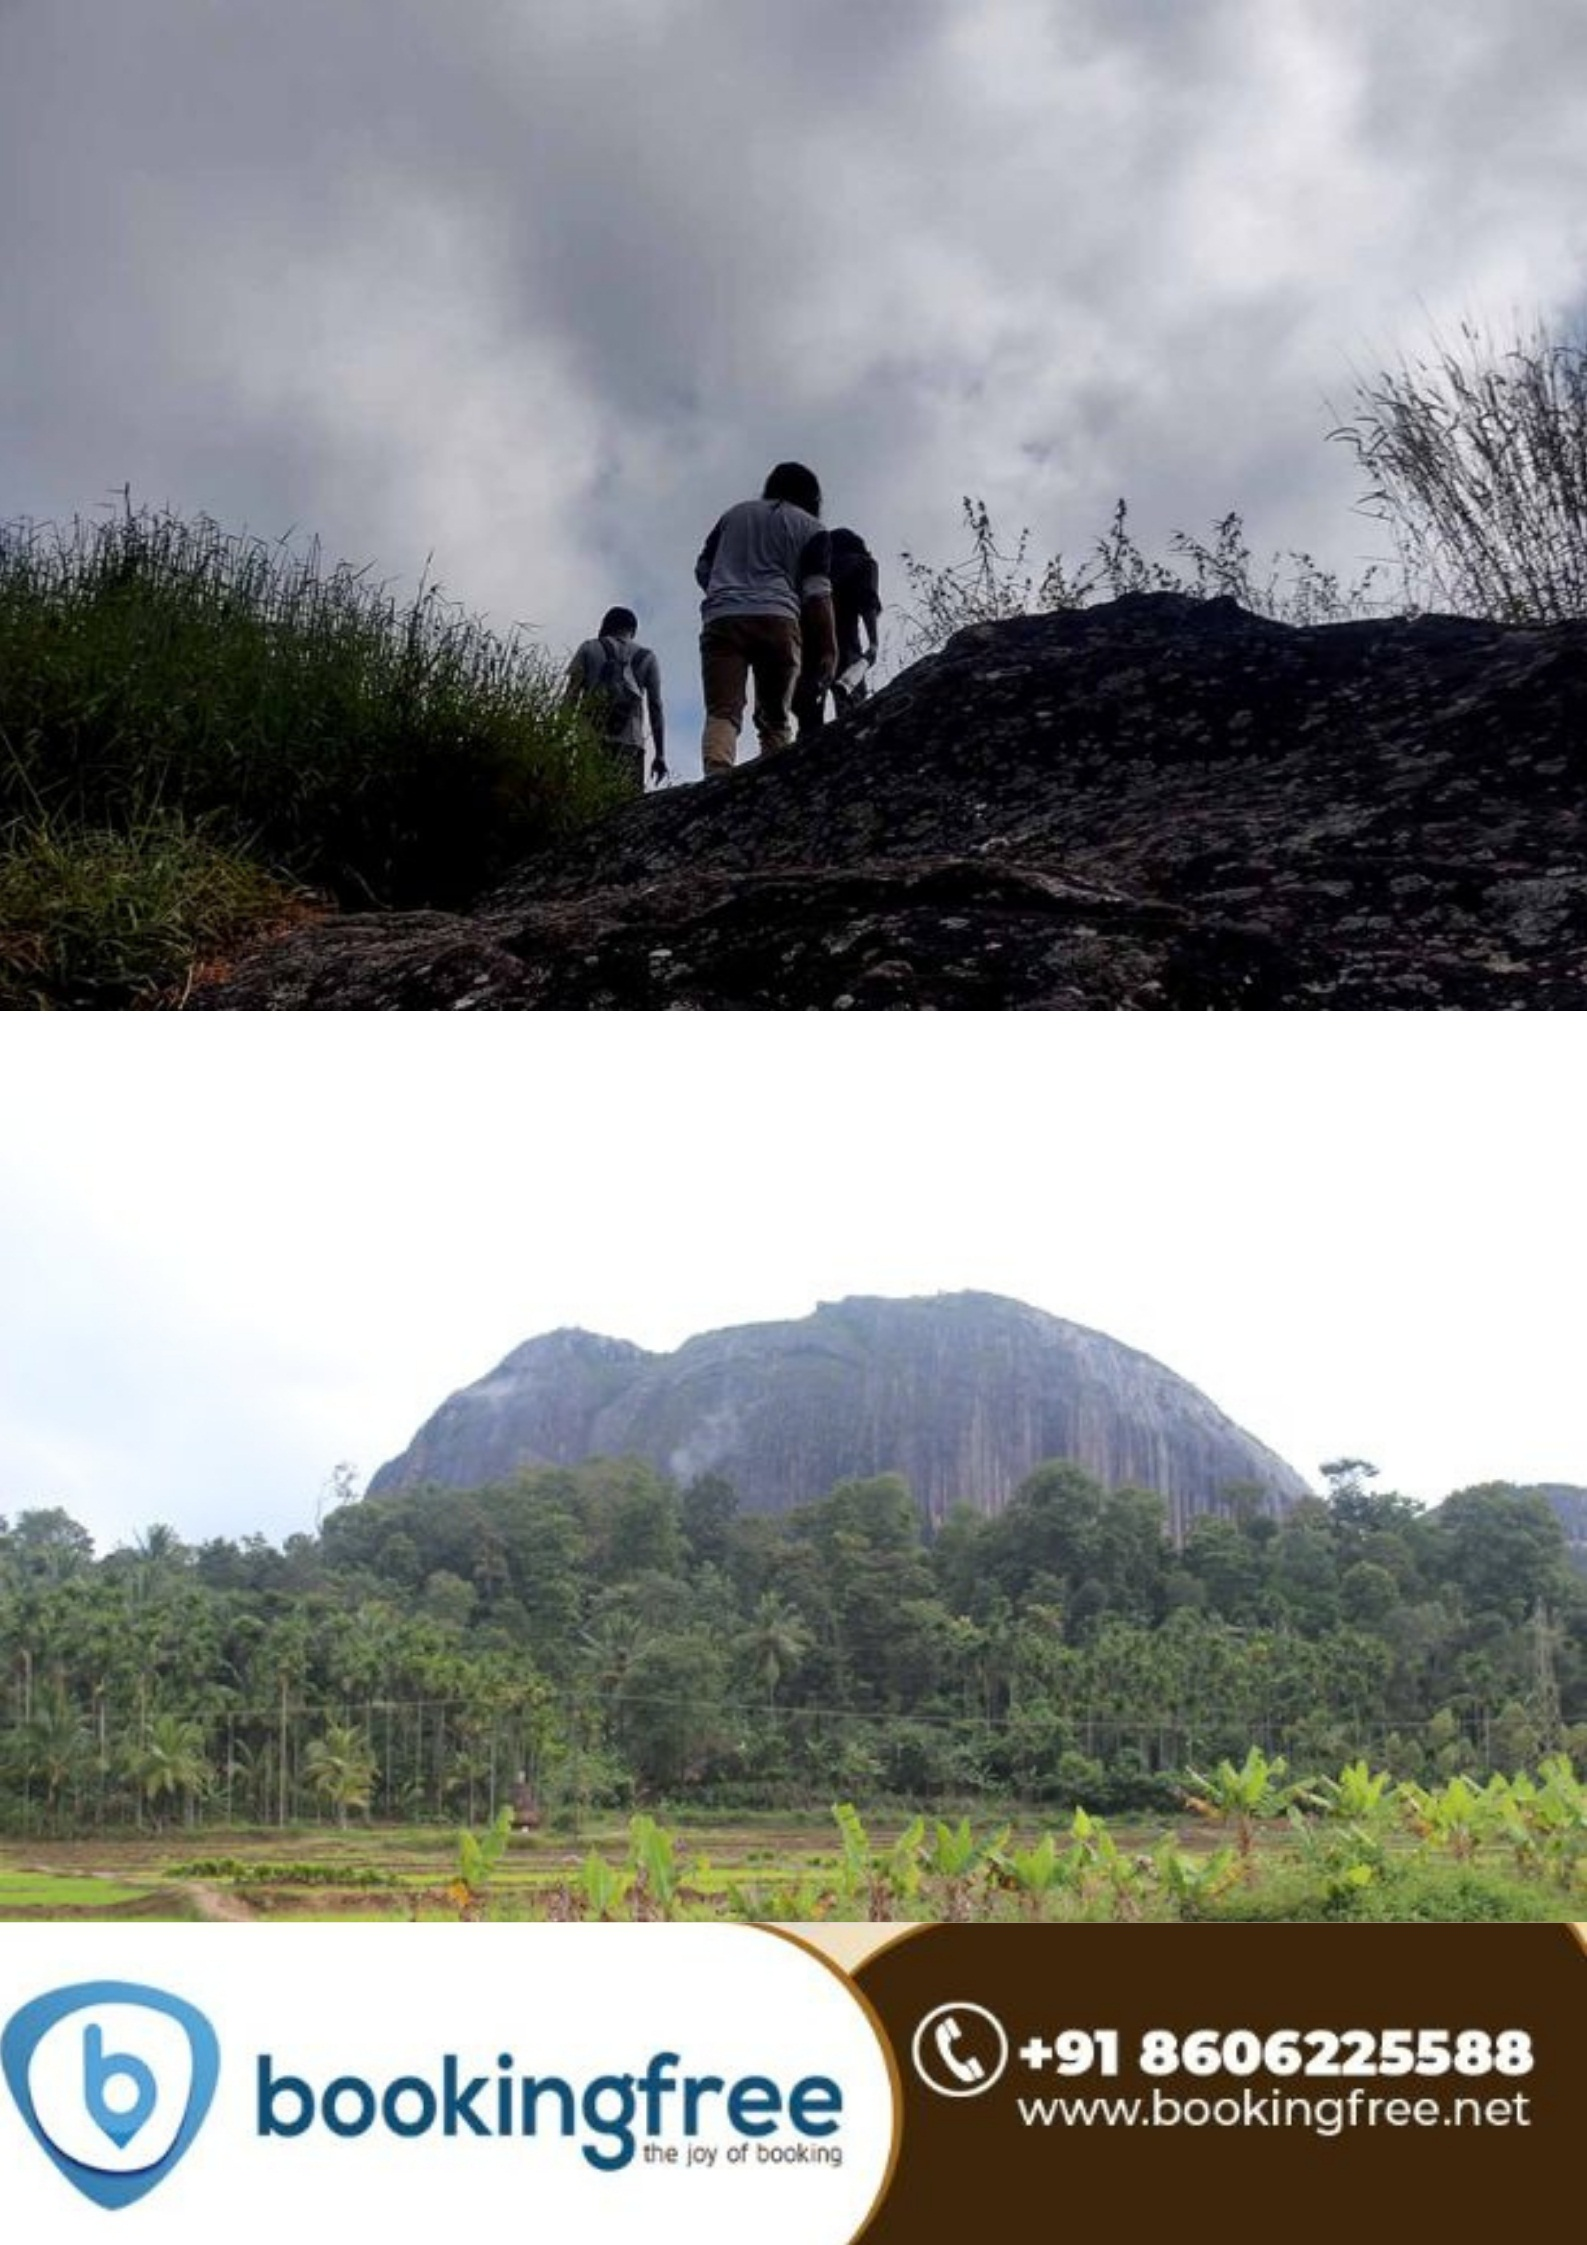 Kolagappara Wayanad